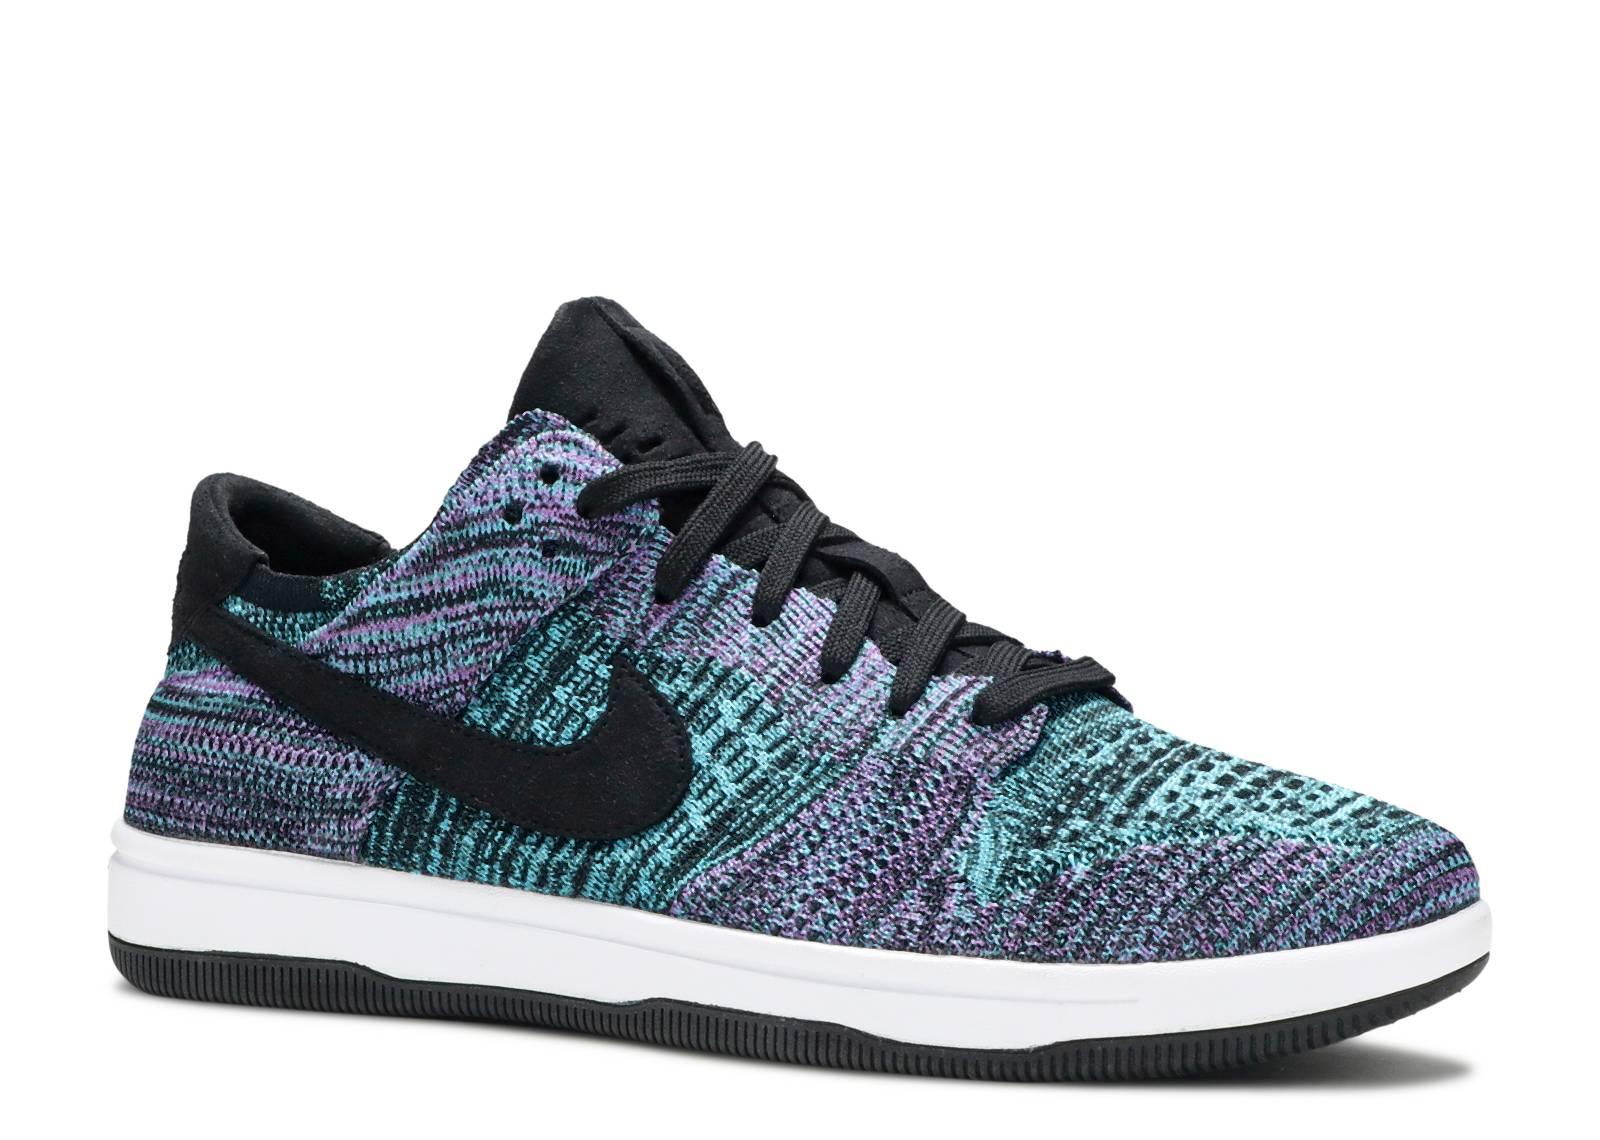 Dunk Flyknit - Nike - 917746 005 - black bright violet white chlorine blue   bcc5320c47e8